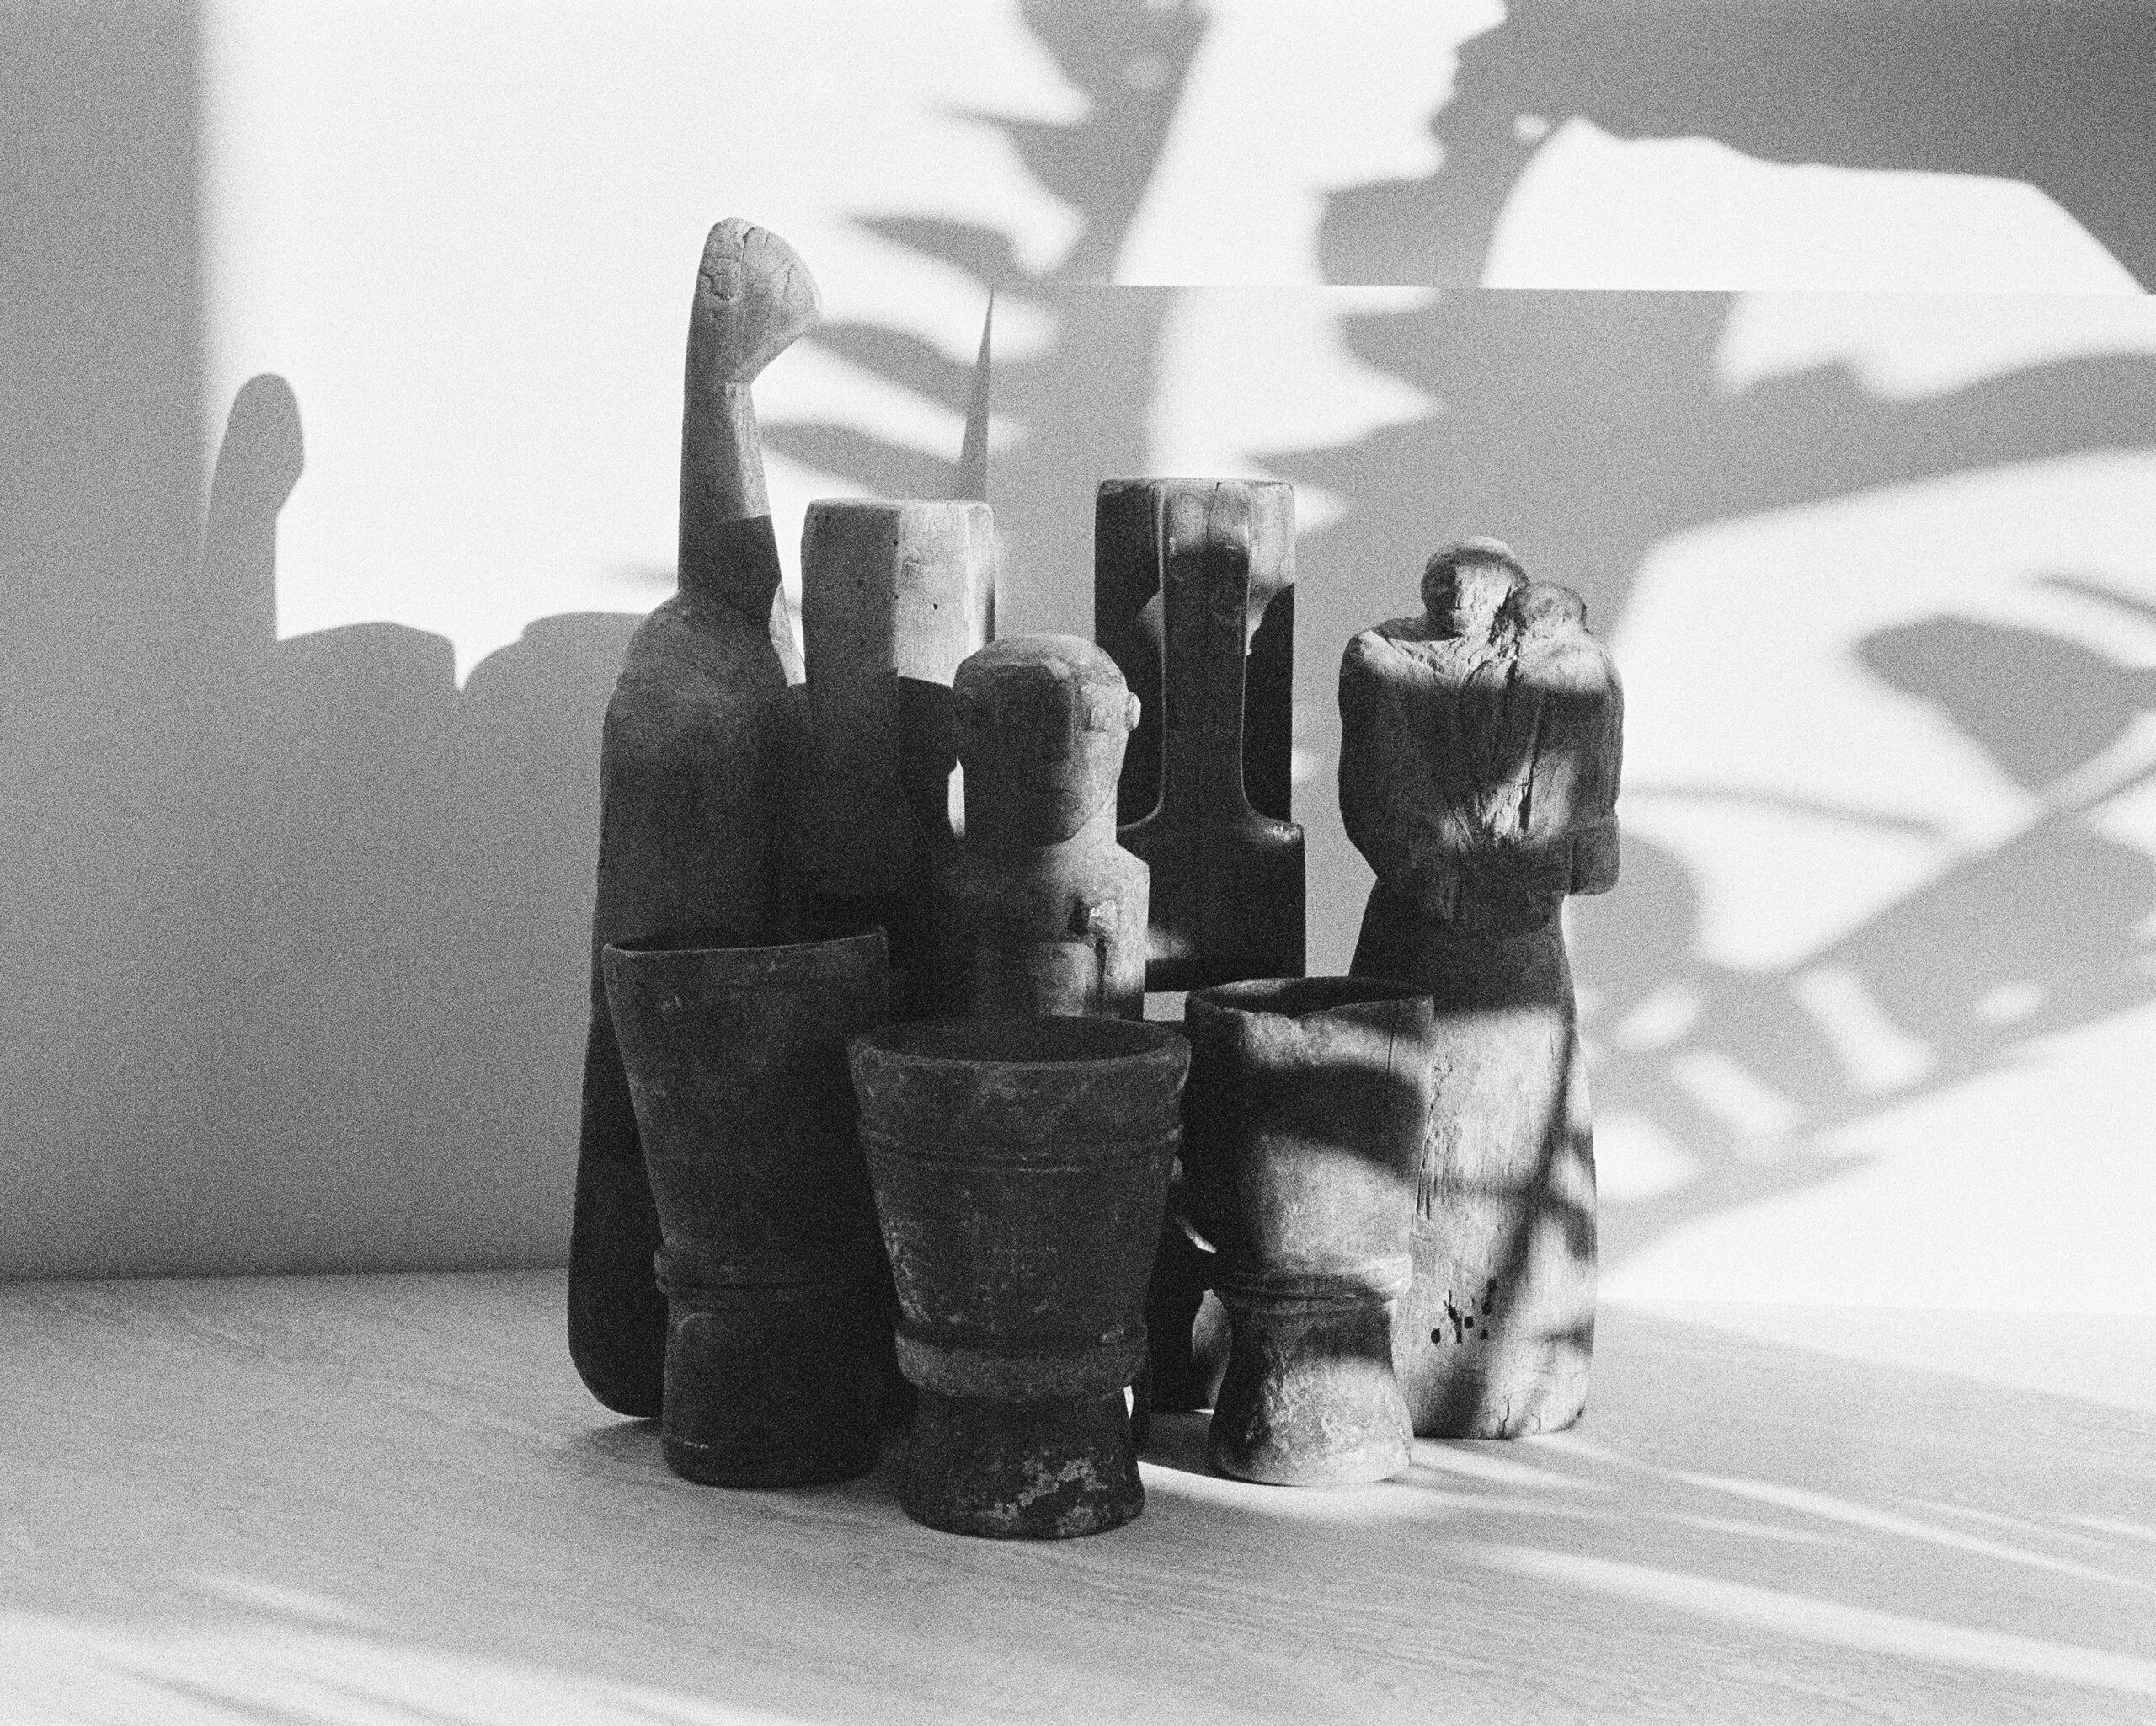 HYBRID ARCHIPELAGO » Intervista a Marco Maria Zanin